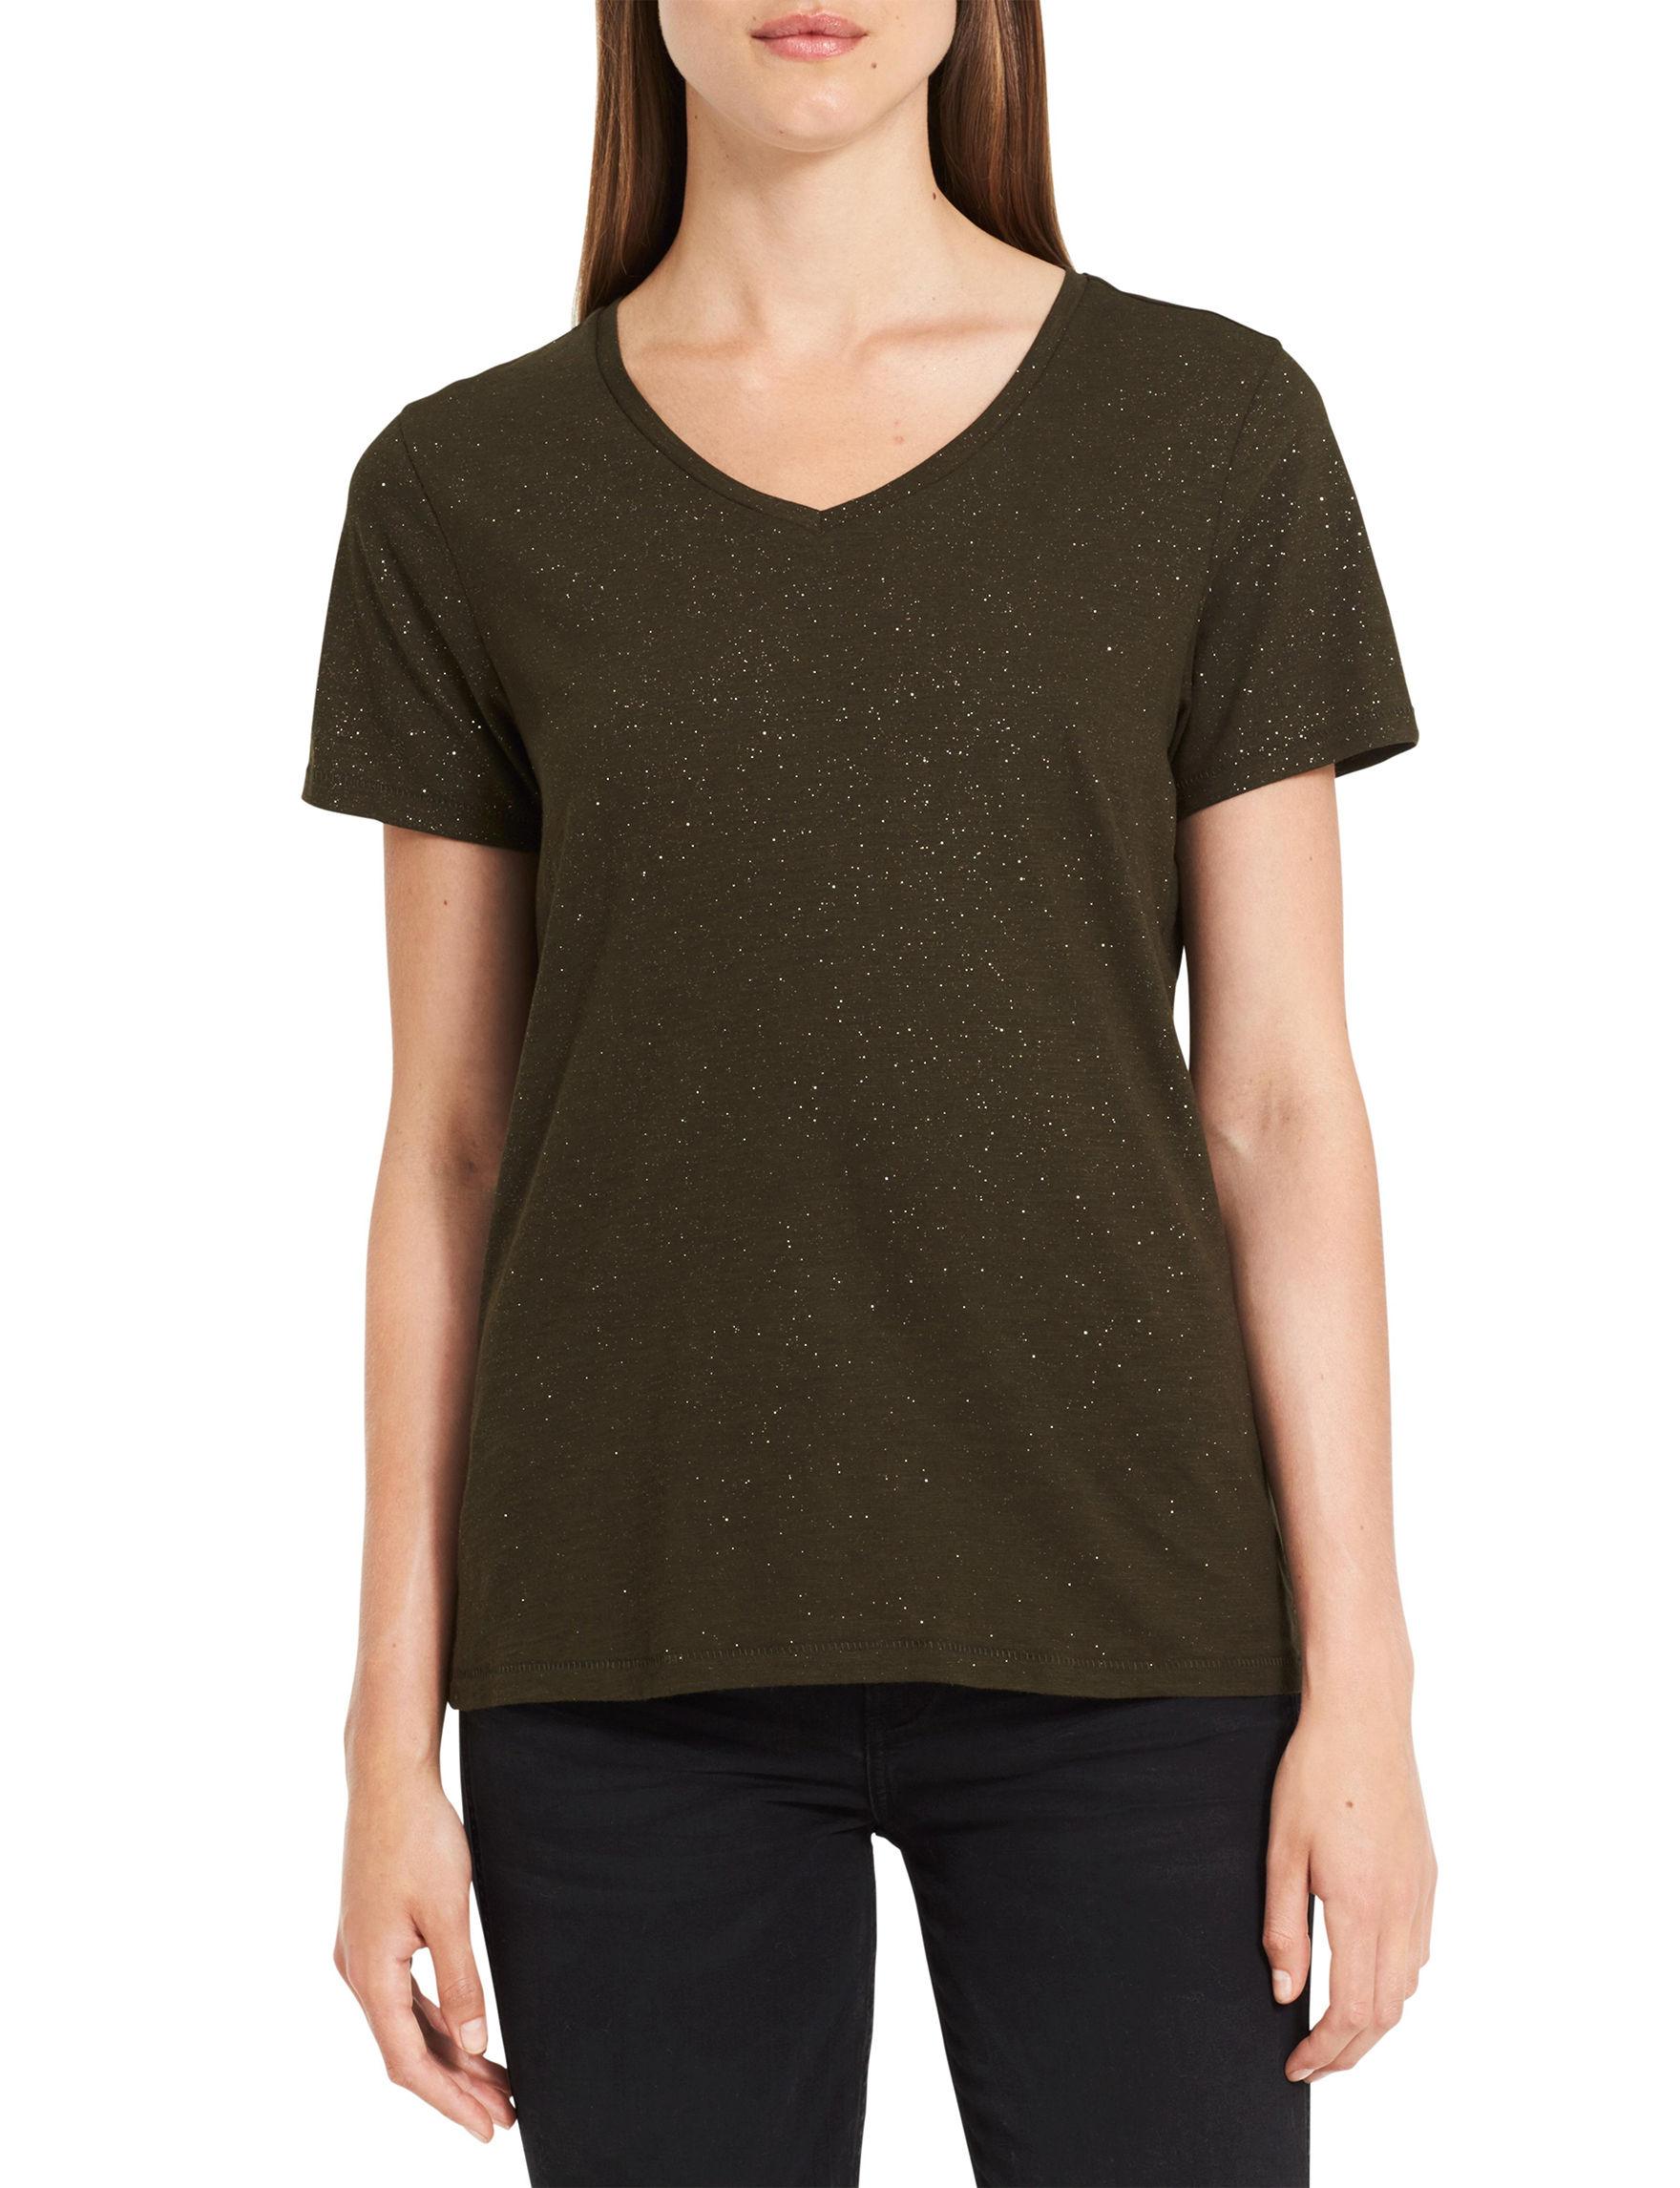 Calvin Klein Jeans Green Tees & Tanks